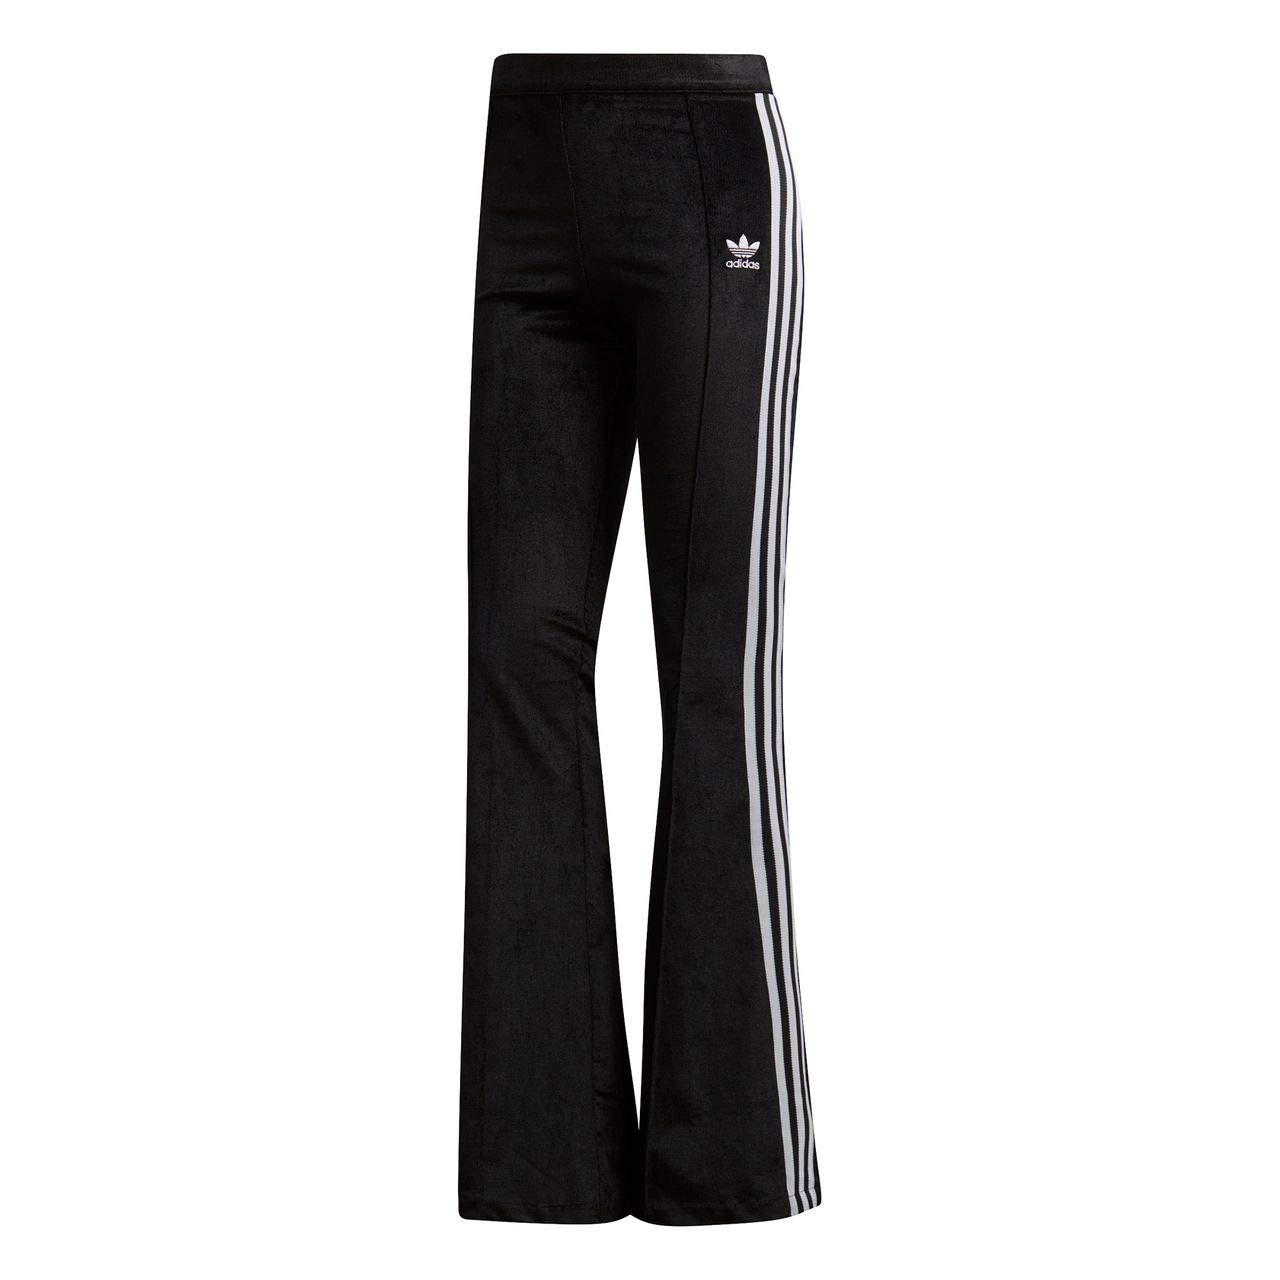 ADIDAS abbigliamento donna pantalone tuta DV2602 FLARED TP